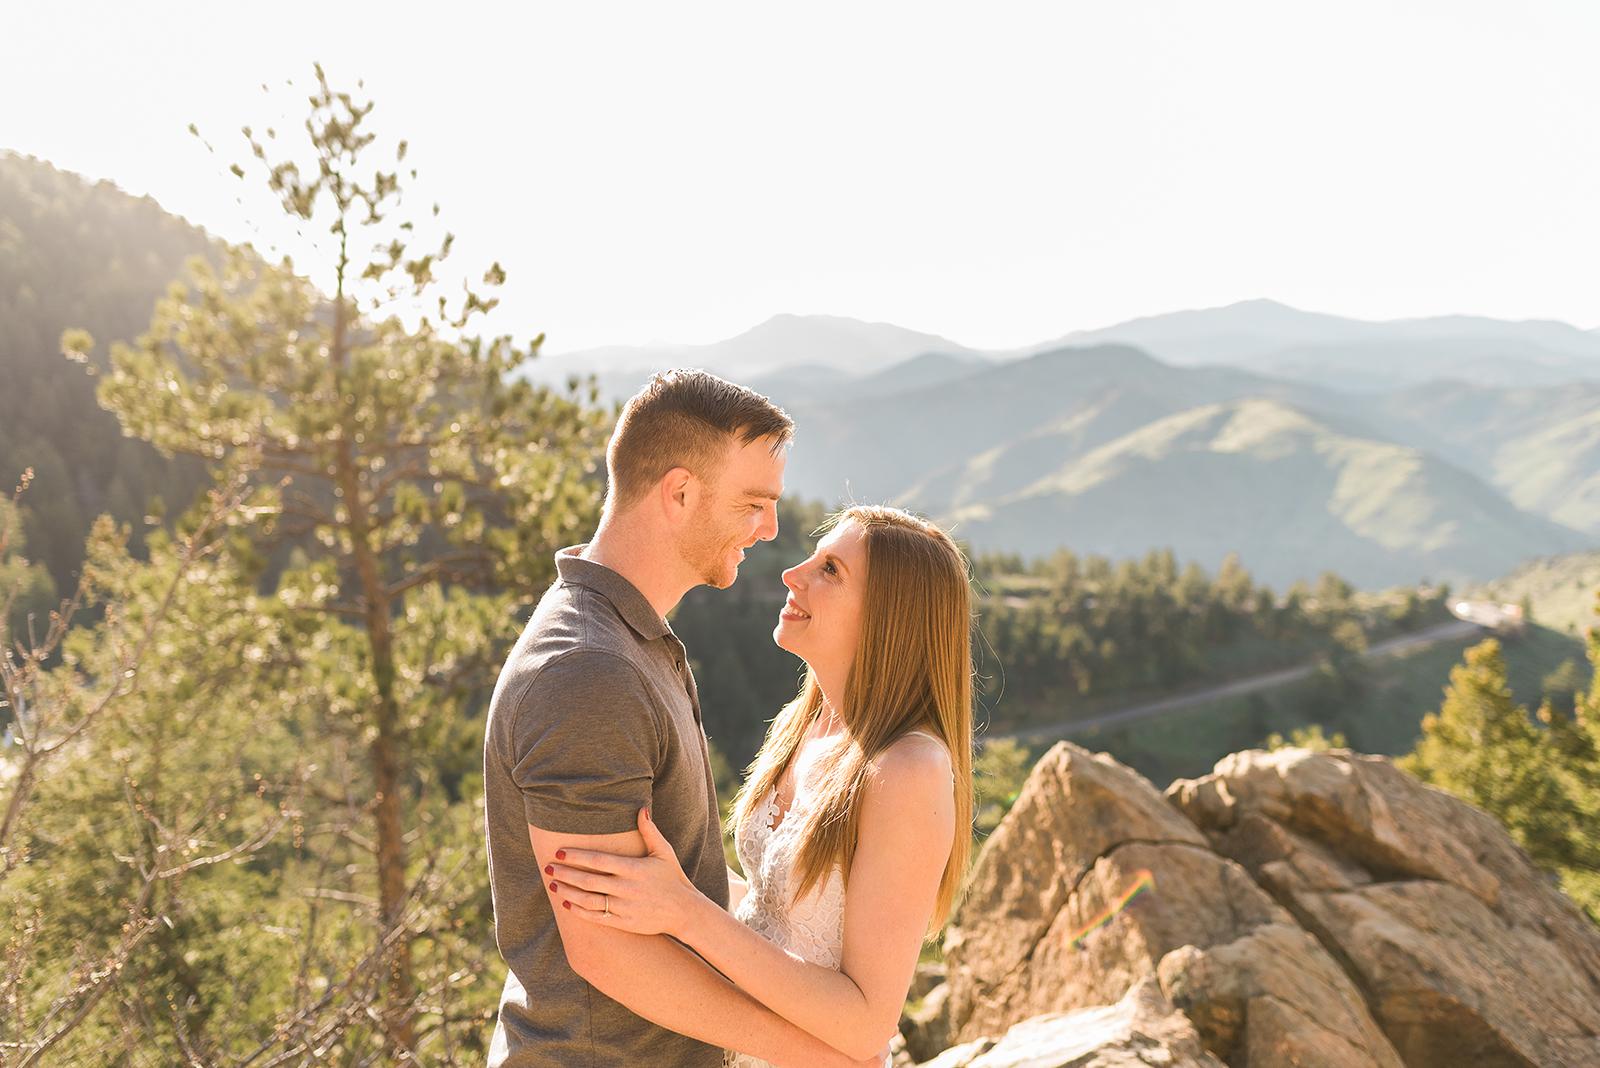 lookout-mountain-engagement-session-denver-engagement-photographer-28.jpg